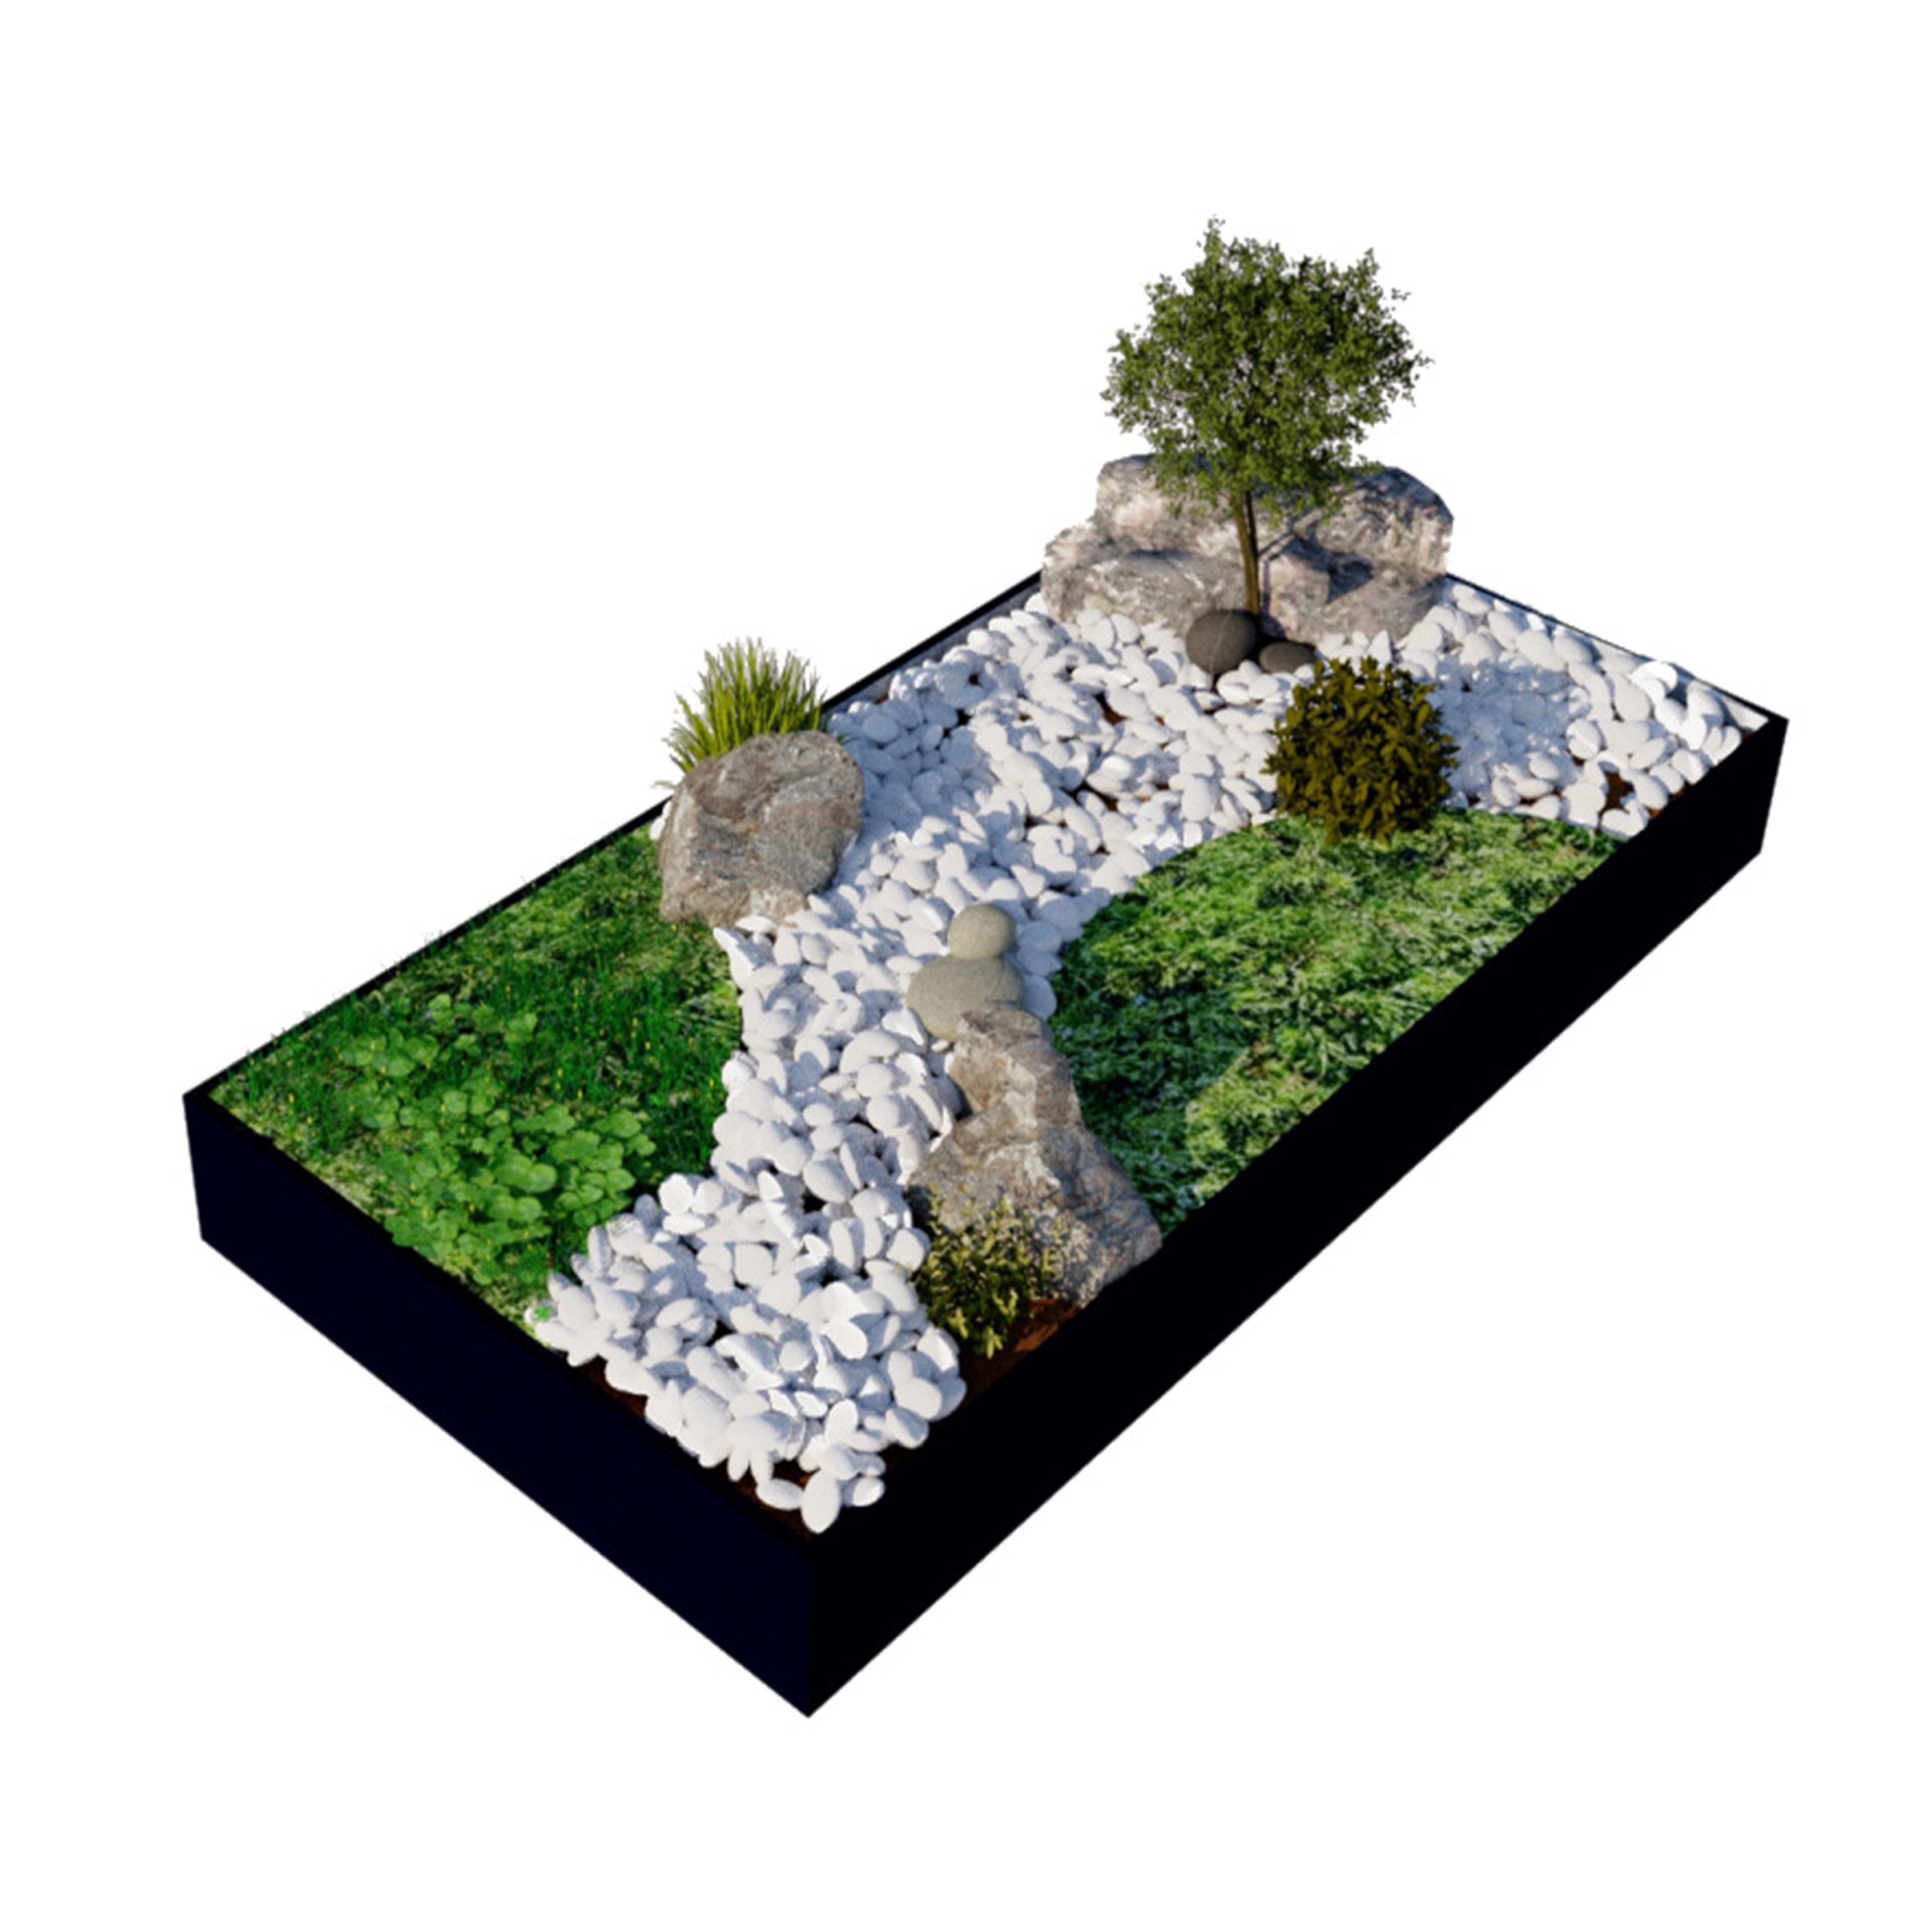 Tombes paysagères, scépultures, végétal, GHC Green hand co Semita